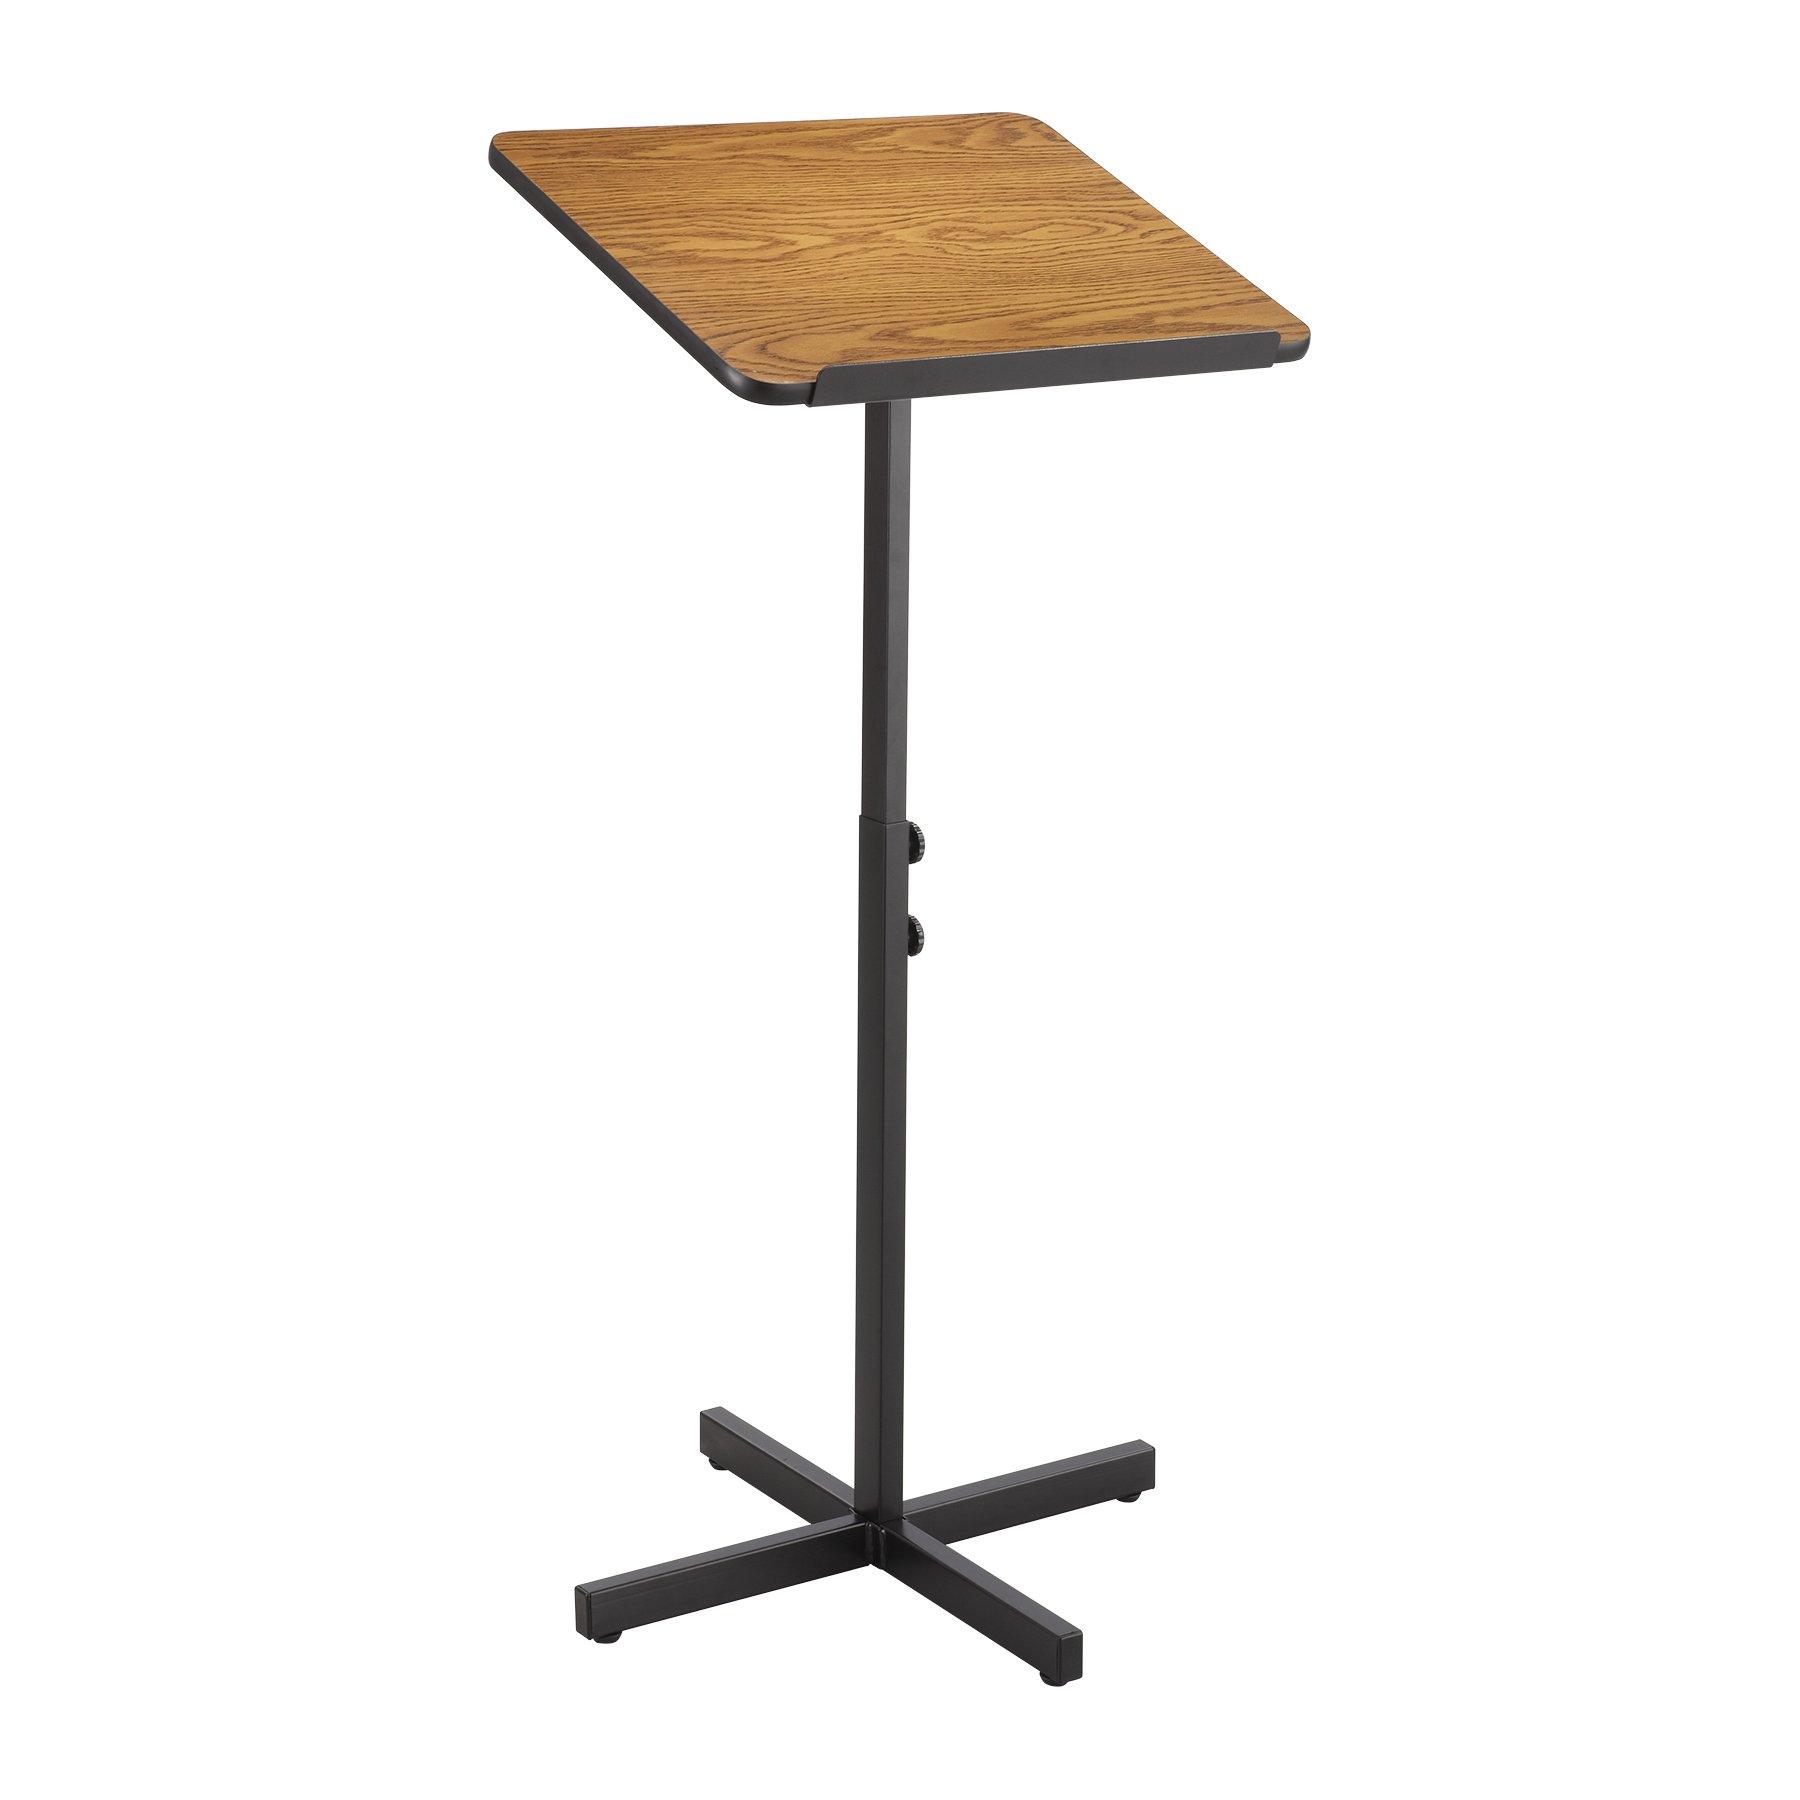 Safco Products 8921MO Adjustable Speaker Lectern Stand, Medium Oak